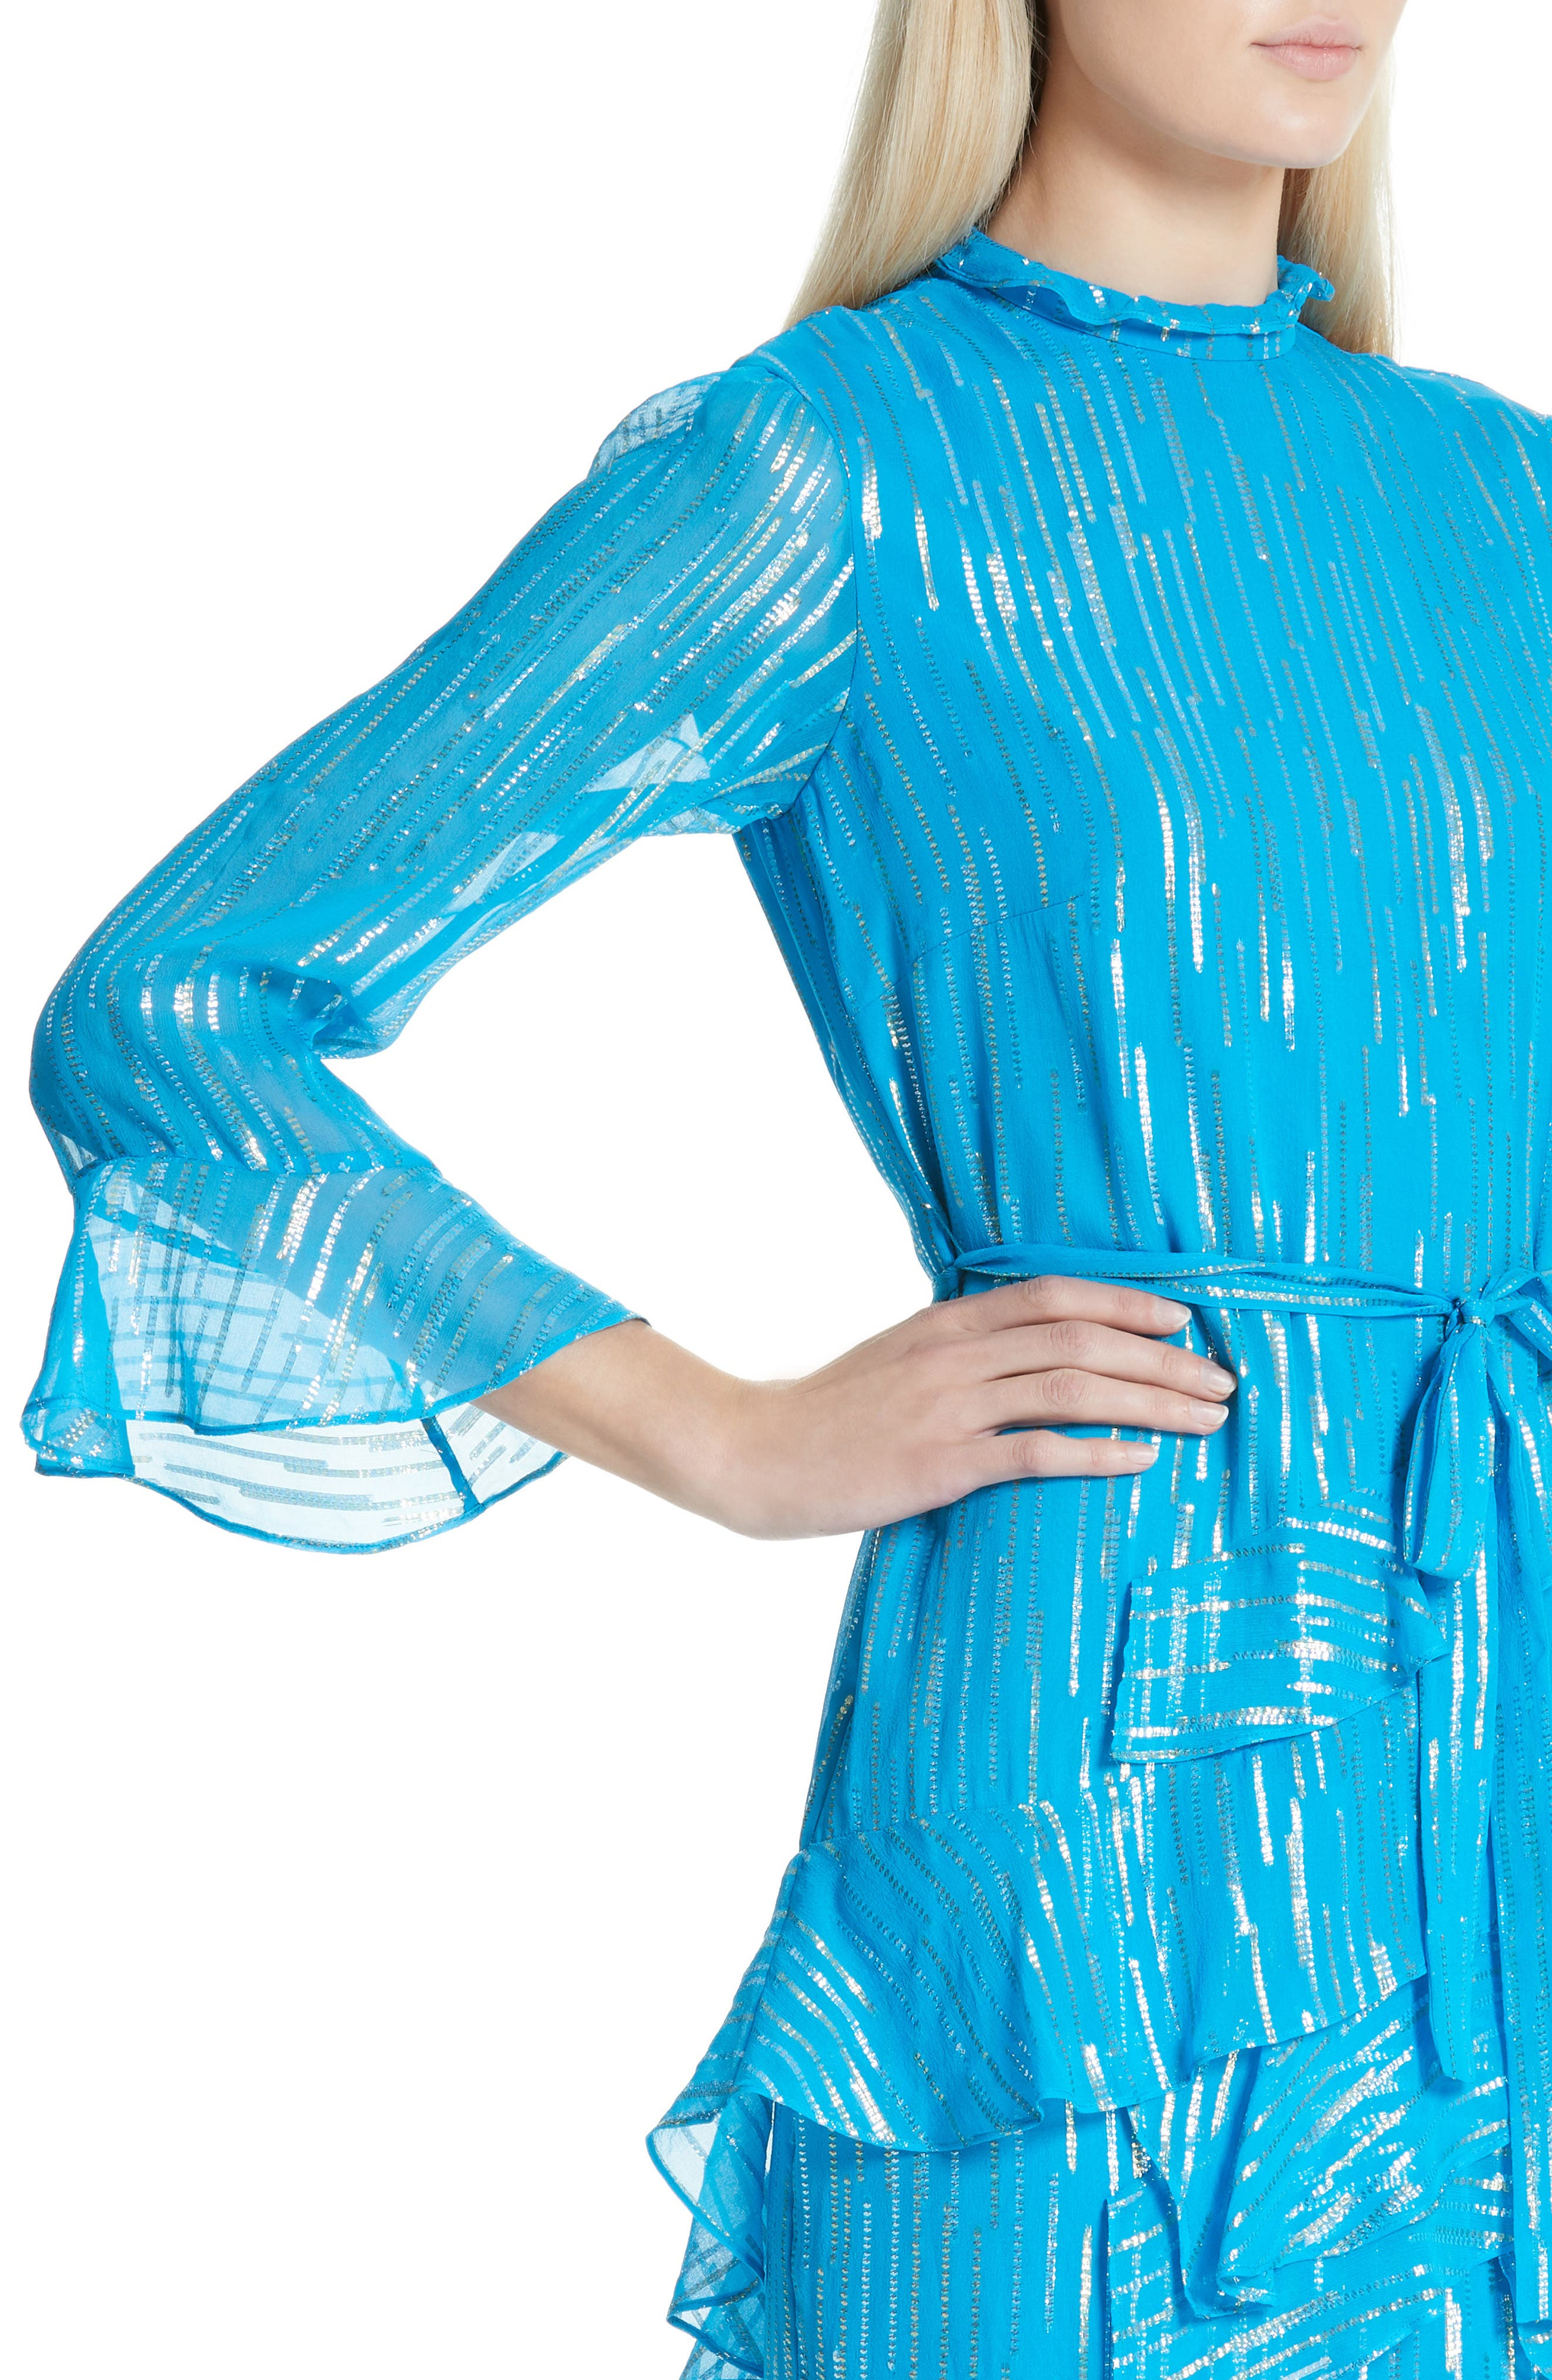 SALONI, Marissa Metallic Ruffle Dress, Alternate thumbnail 5, color, TURQUOISE/ METALLIC